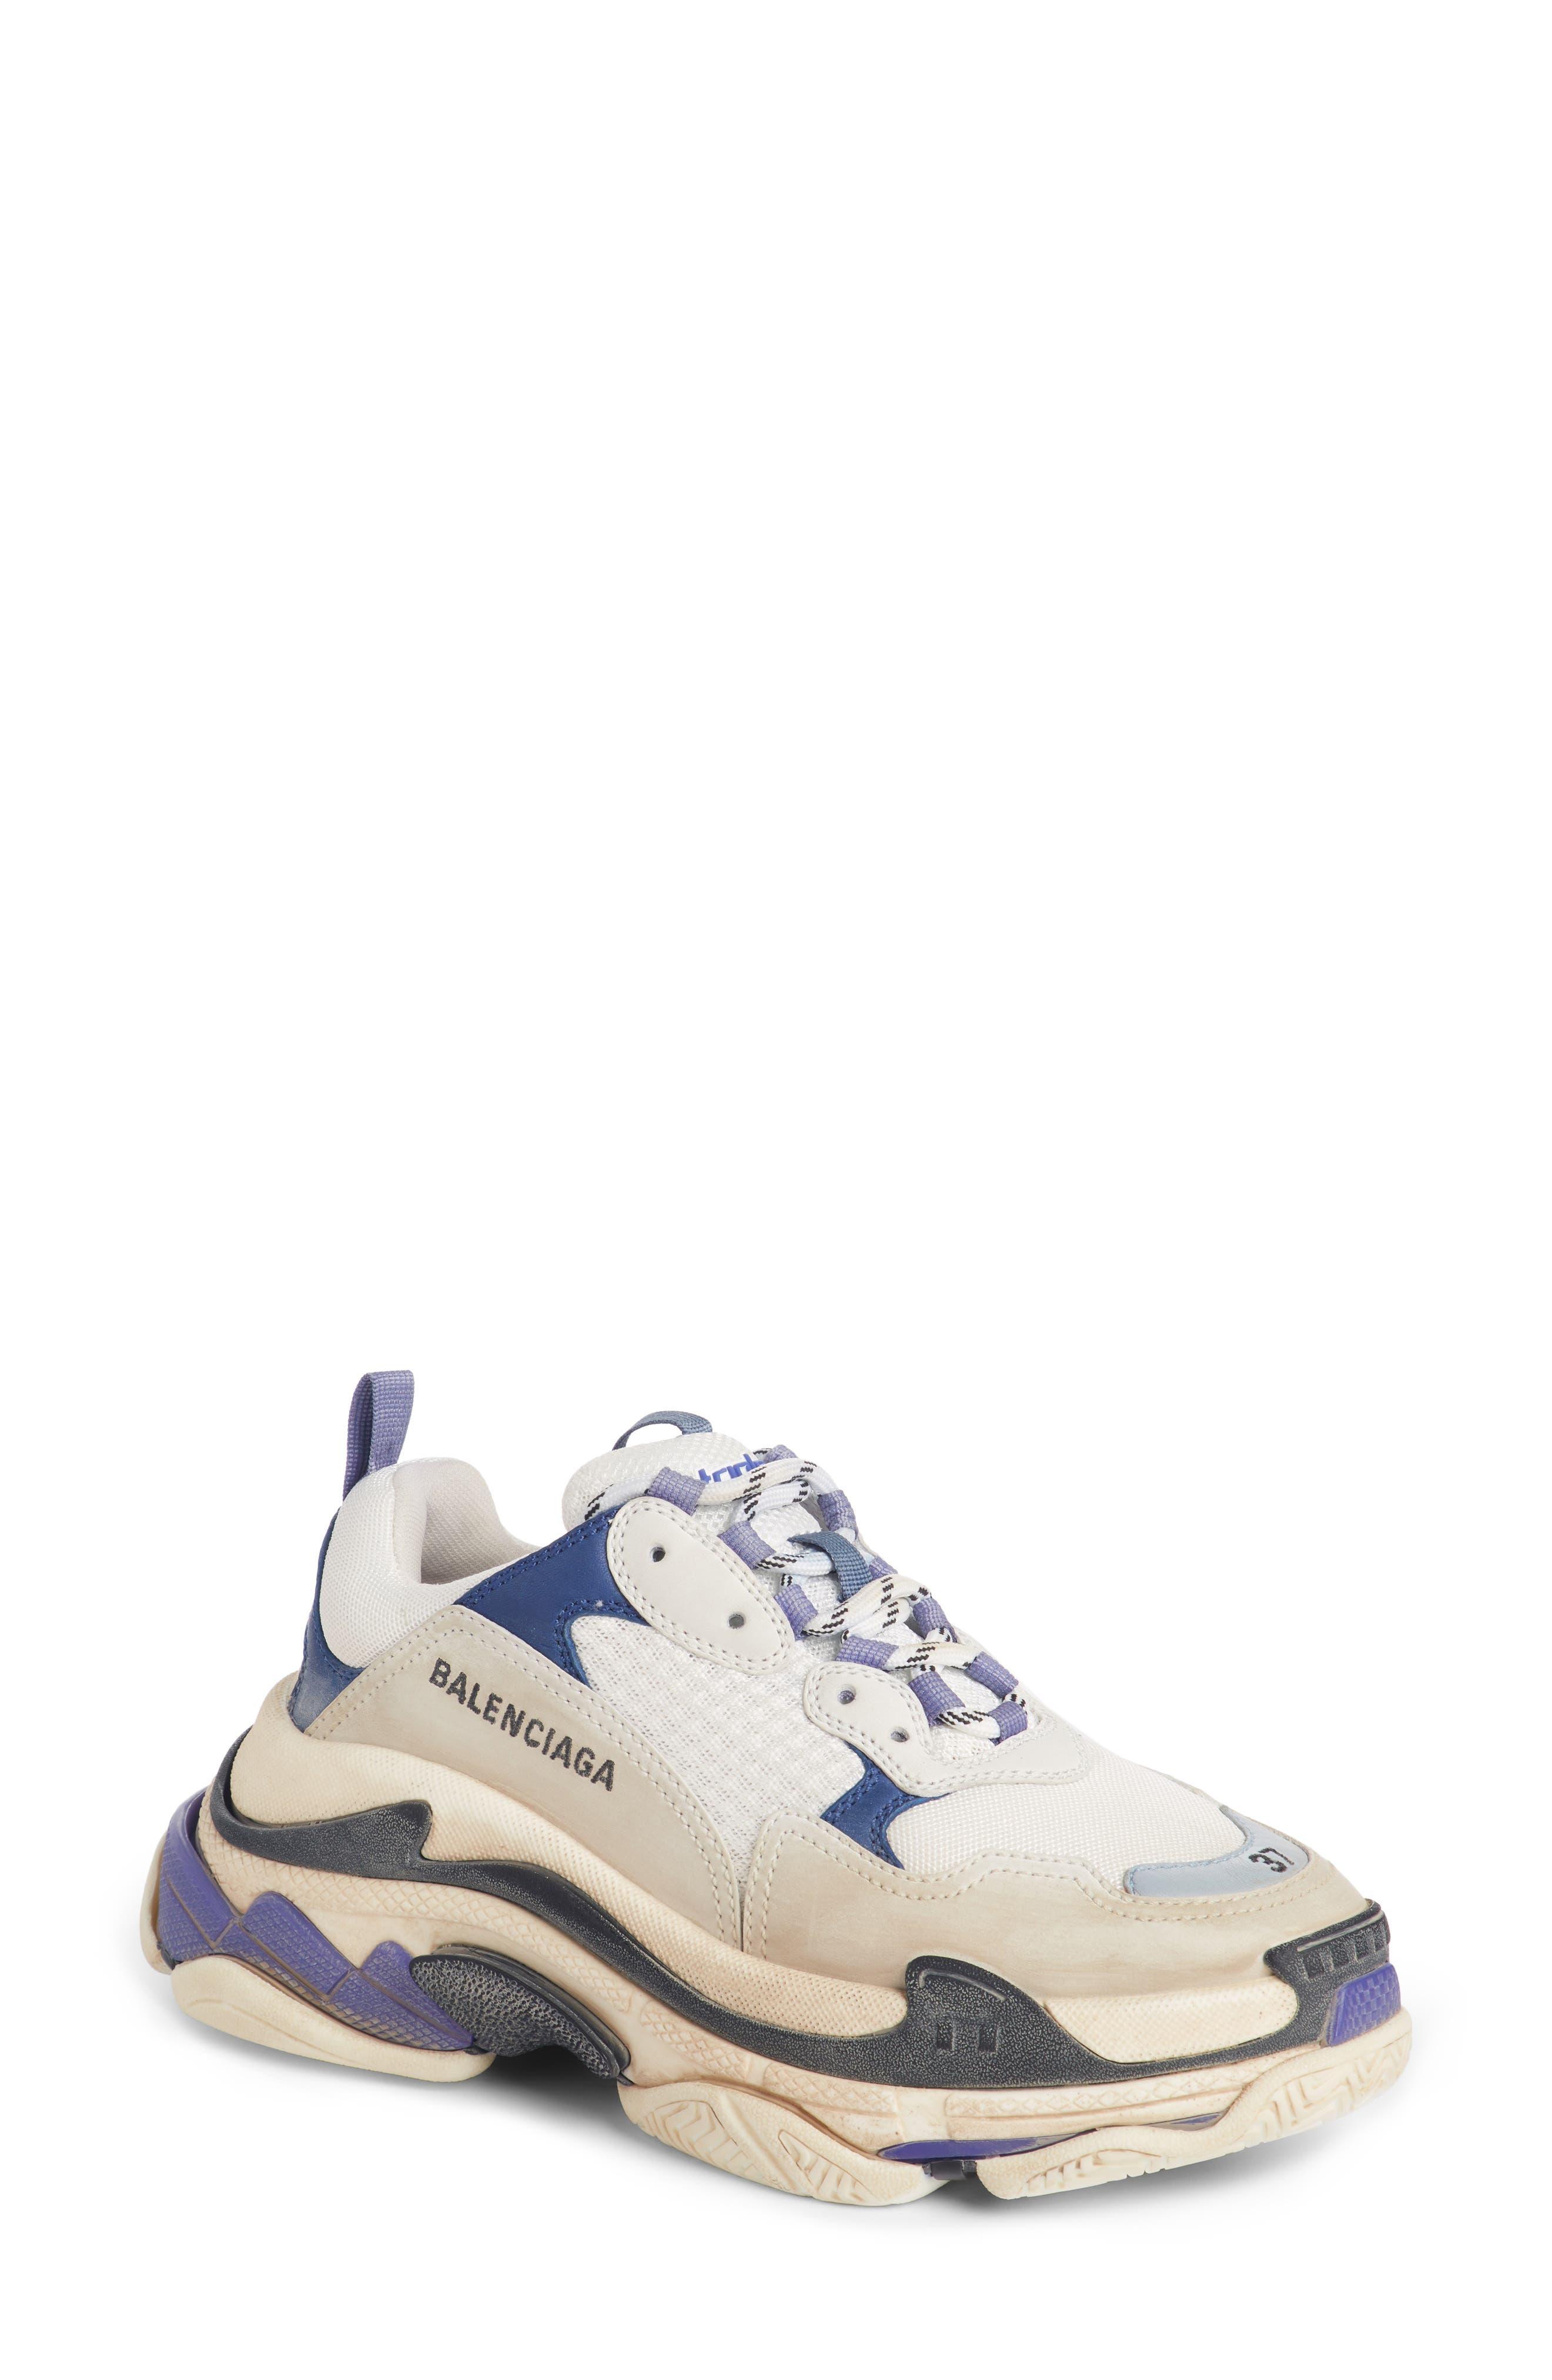 Balenciaga Triple S Sneaker (Women